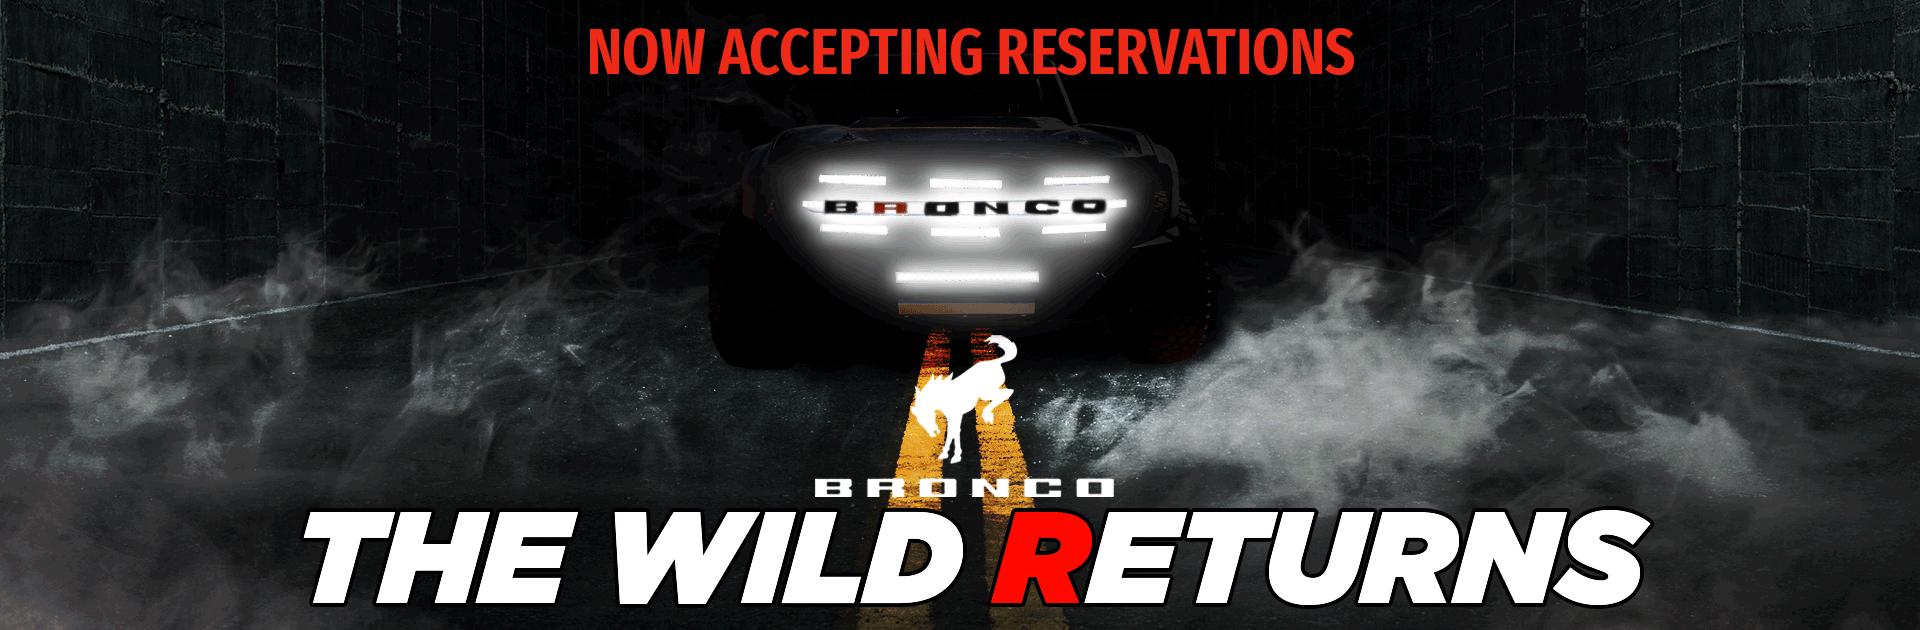 Bronco Updated